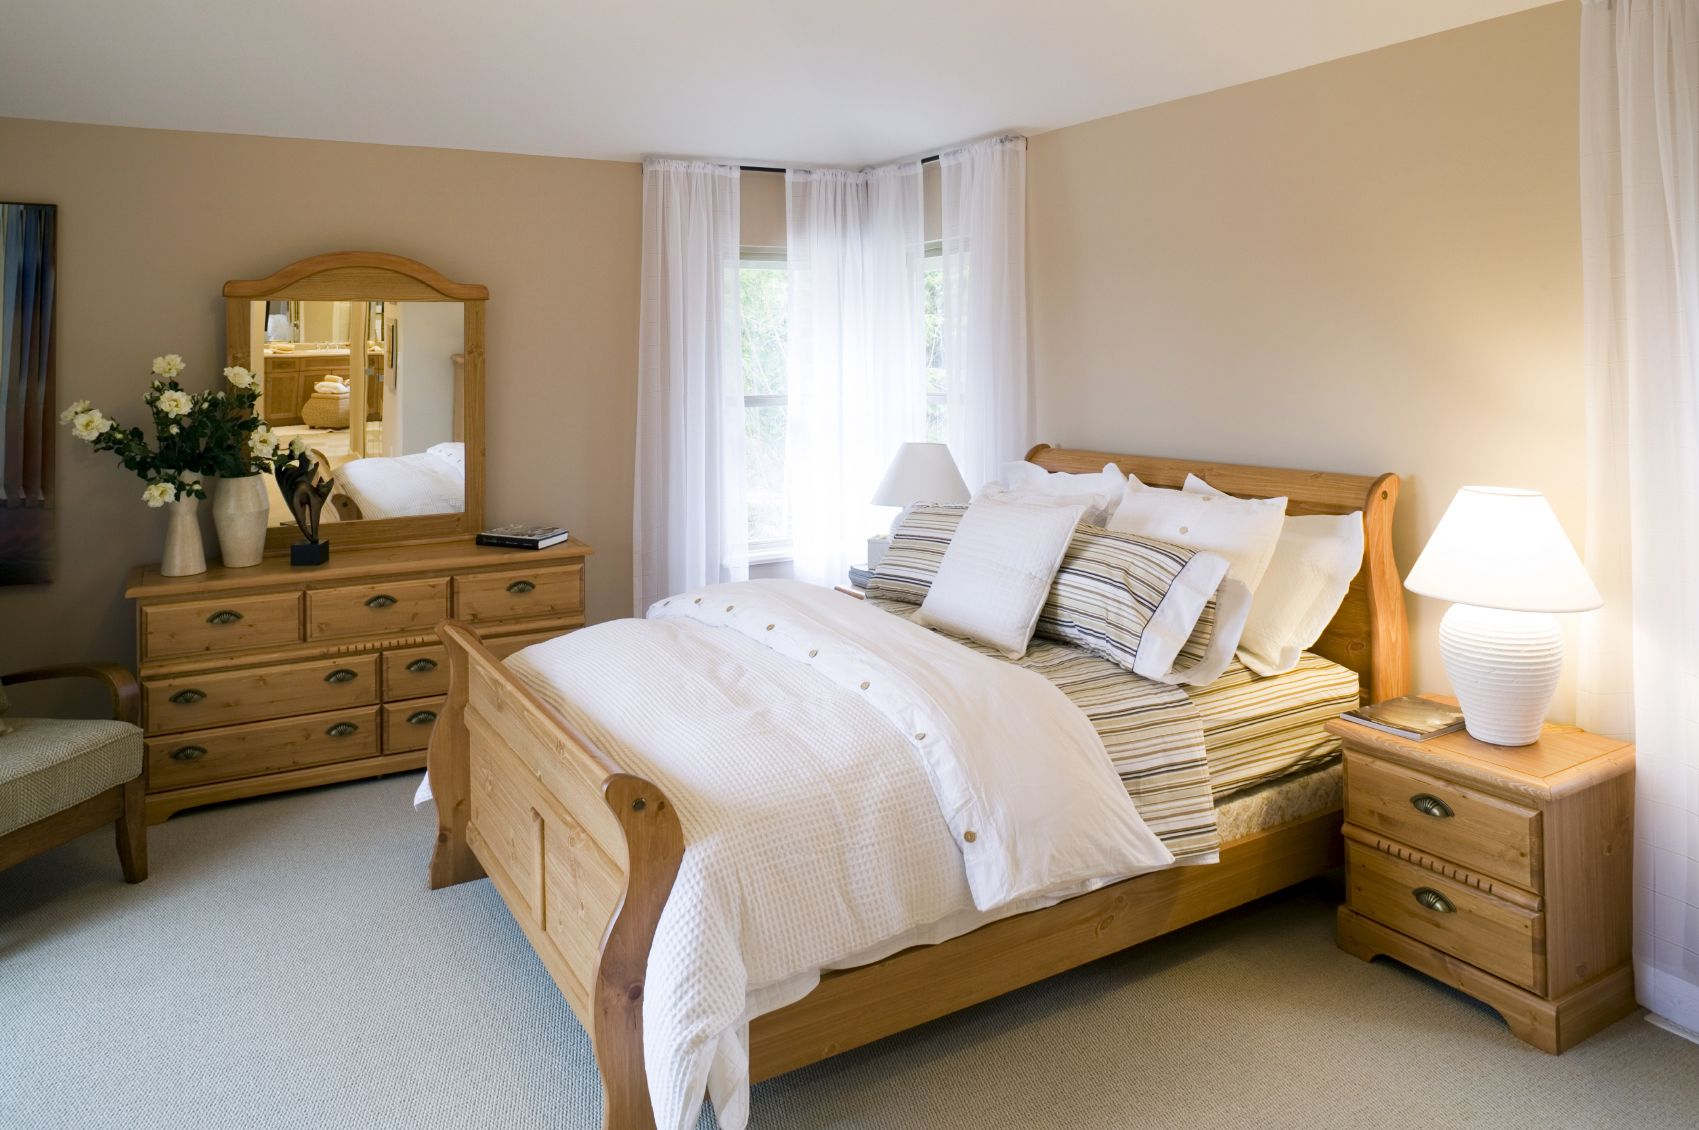 Inca by Beaulieu Minimalist bedroom furniture